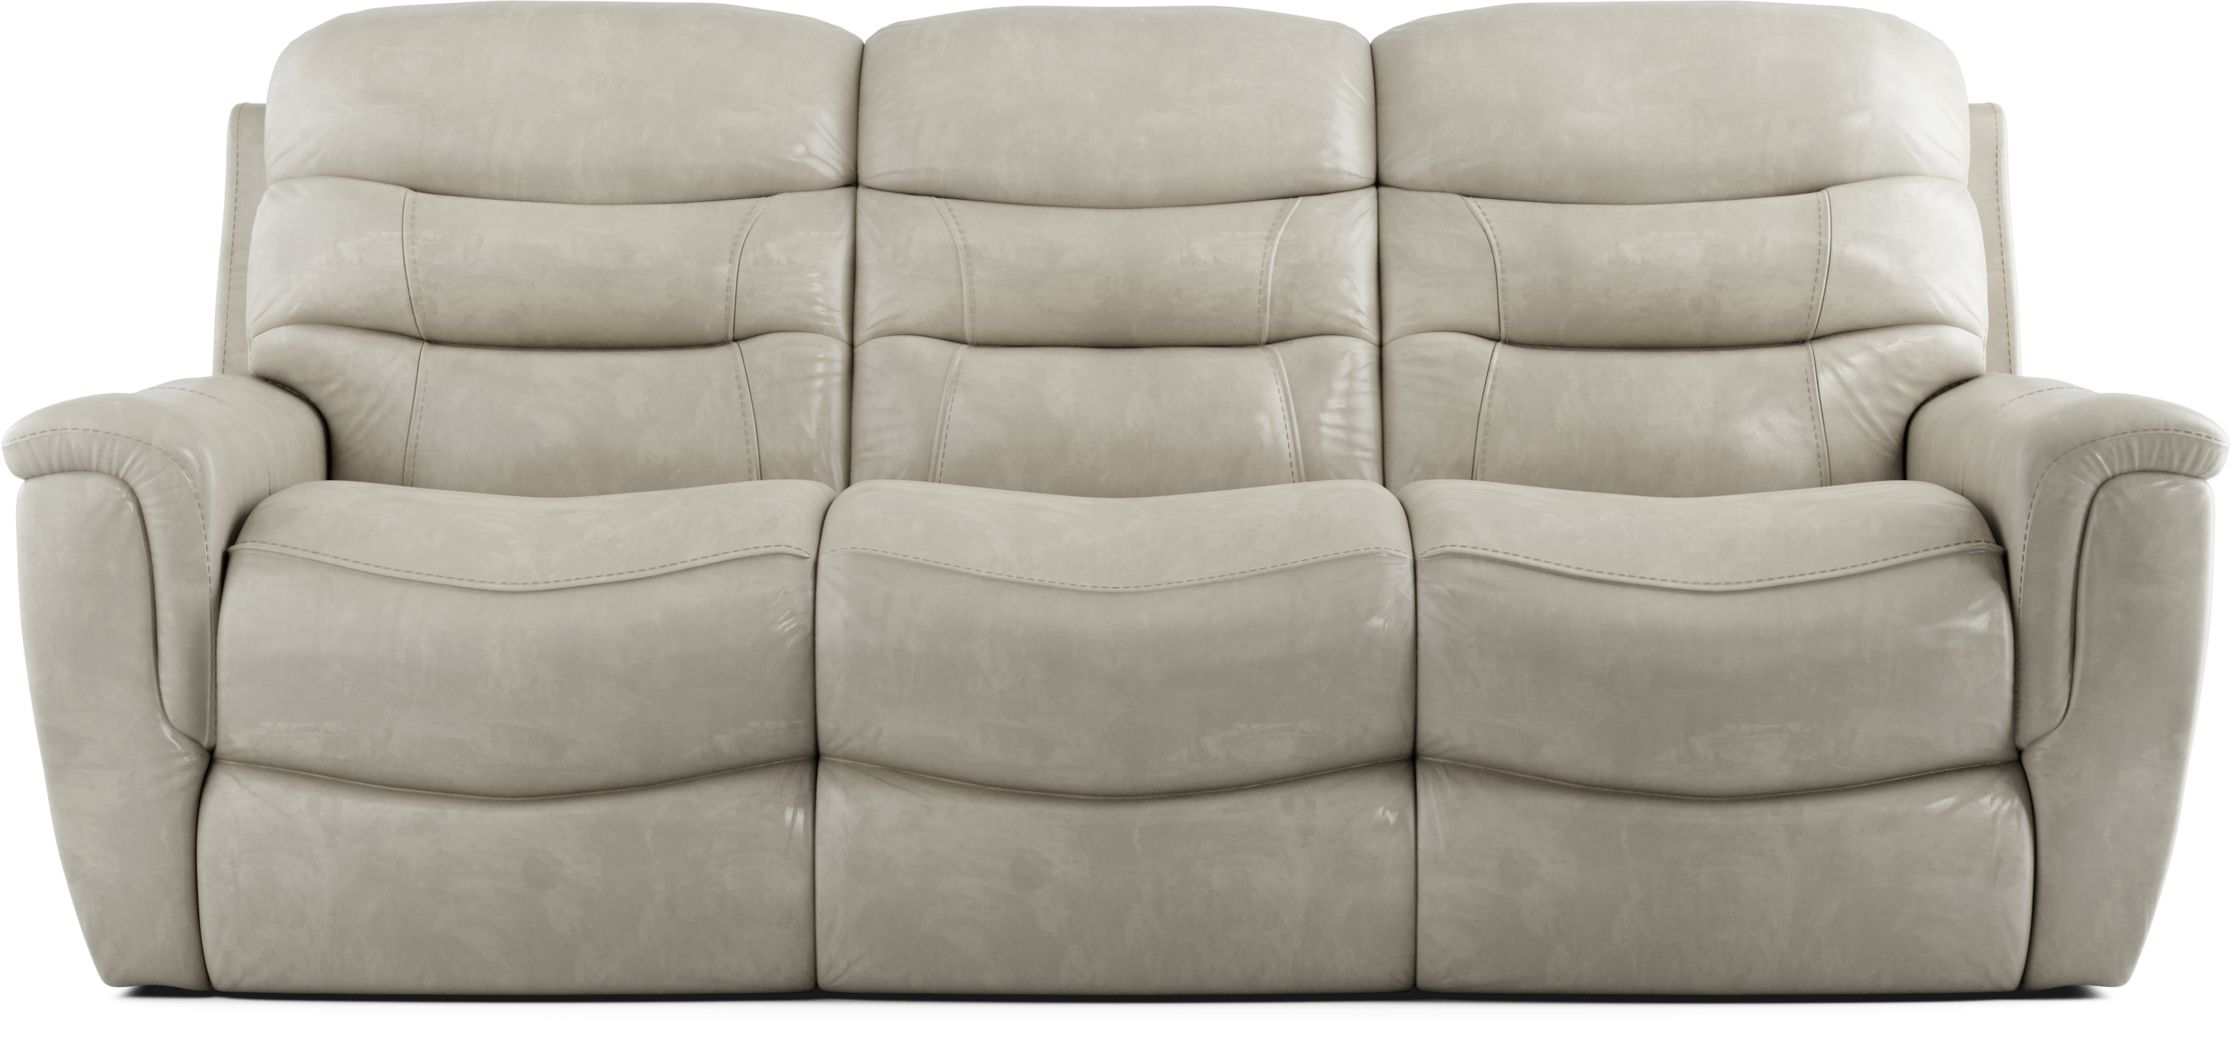 Sabella Stone Leather Reclining Sofa